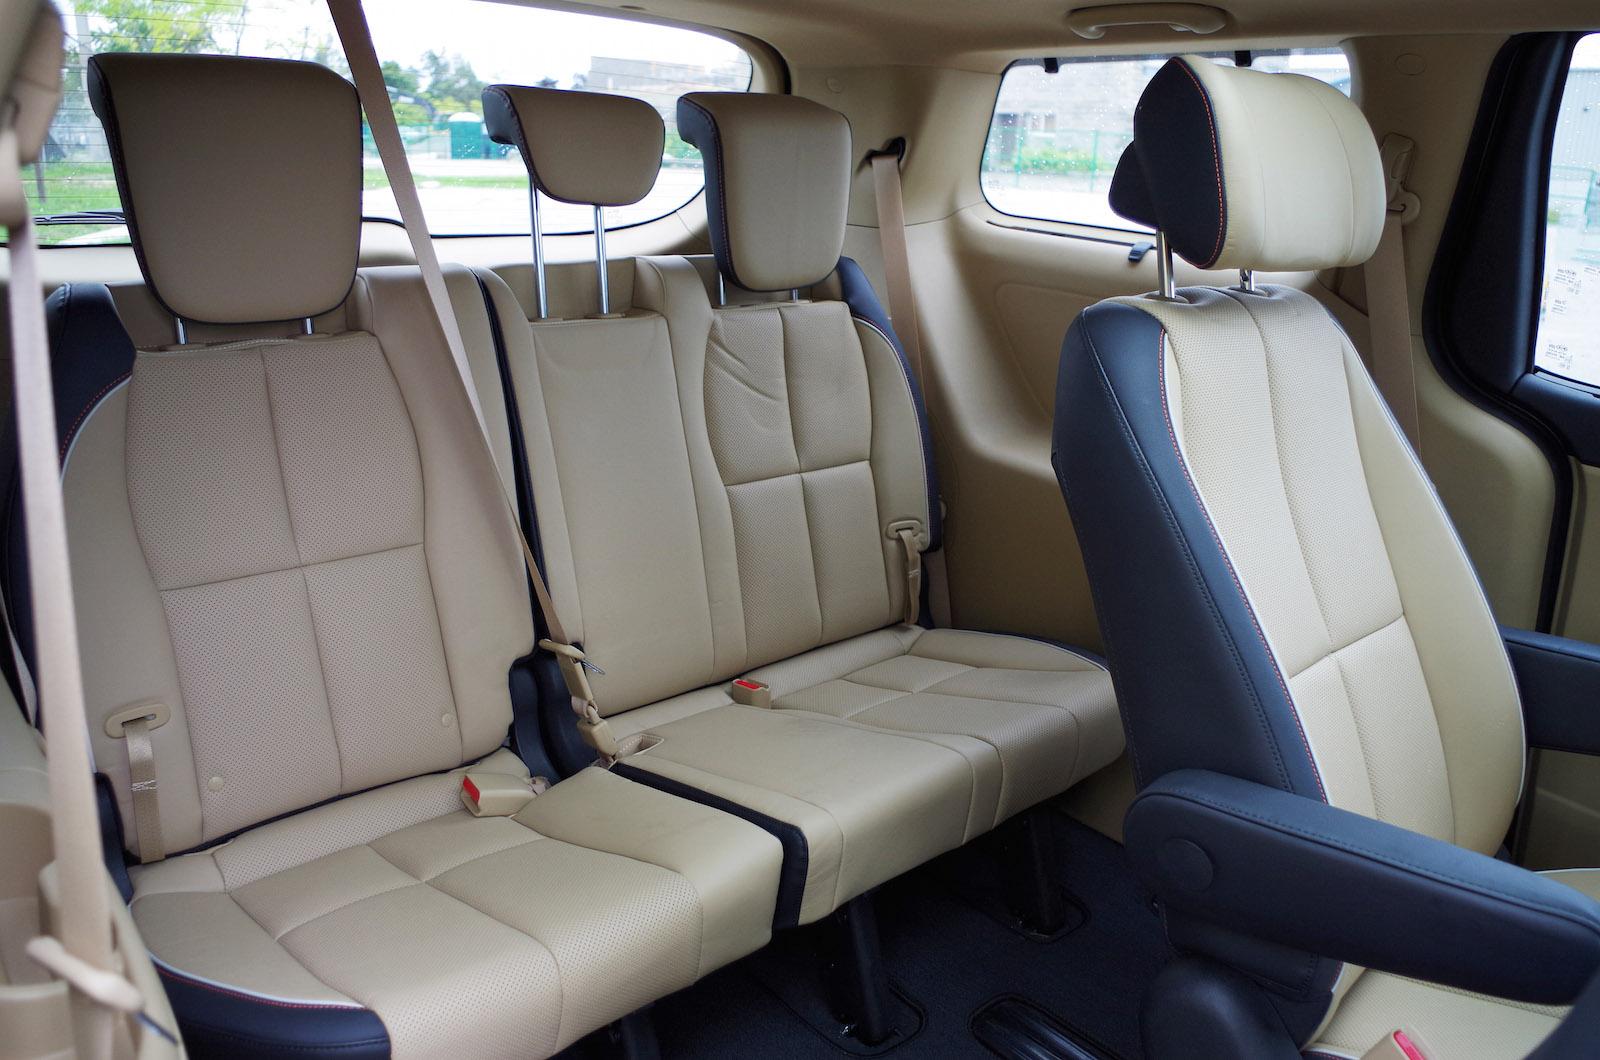 Review 2015 Kia Sedona Sxl Canadian Auto Sorento Captain Chairs Third Row Seats